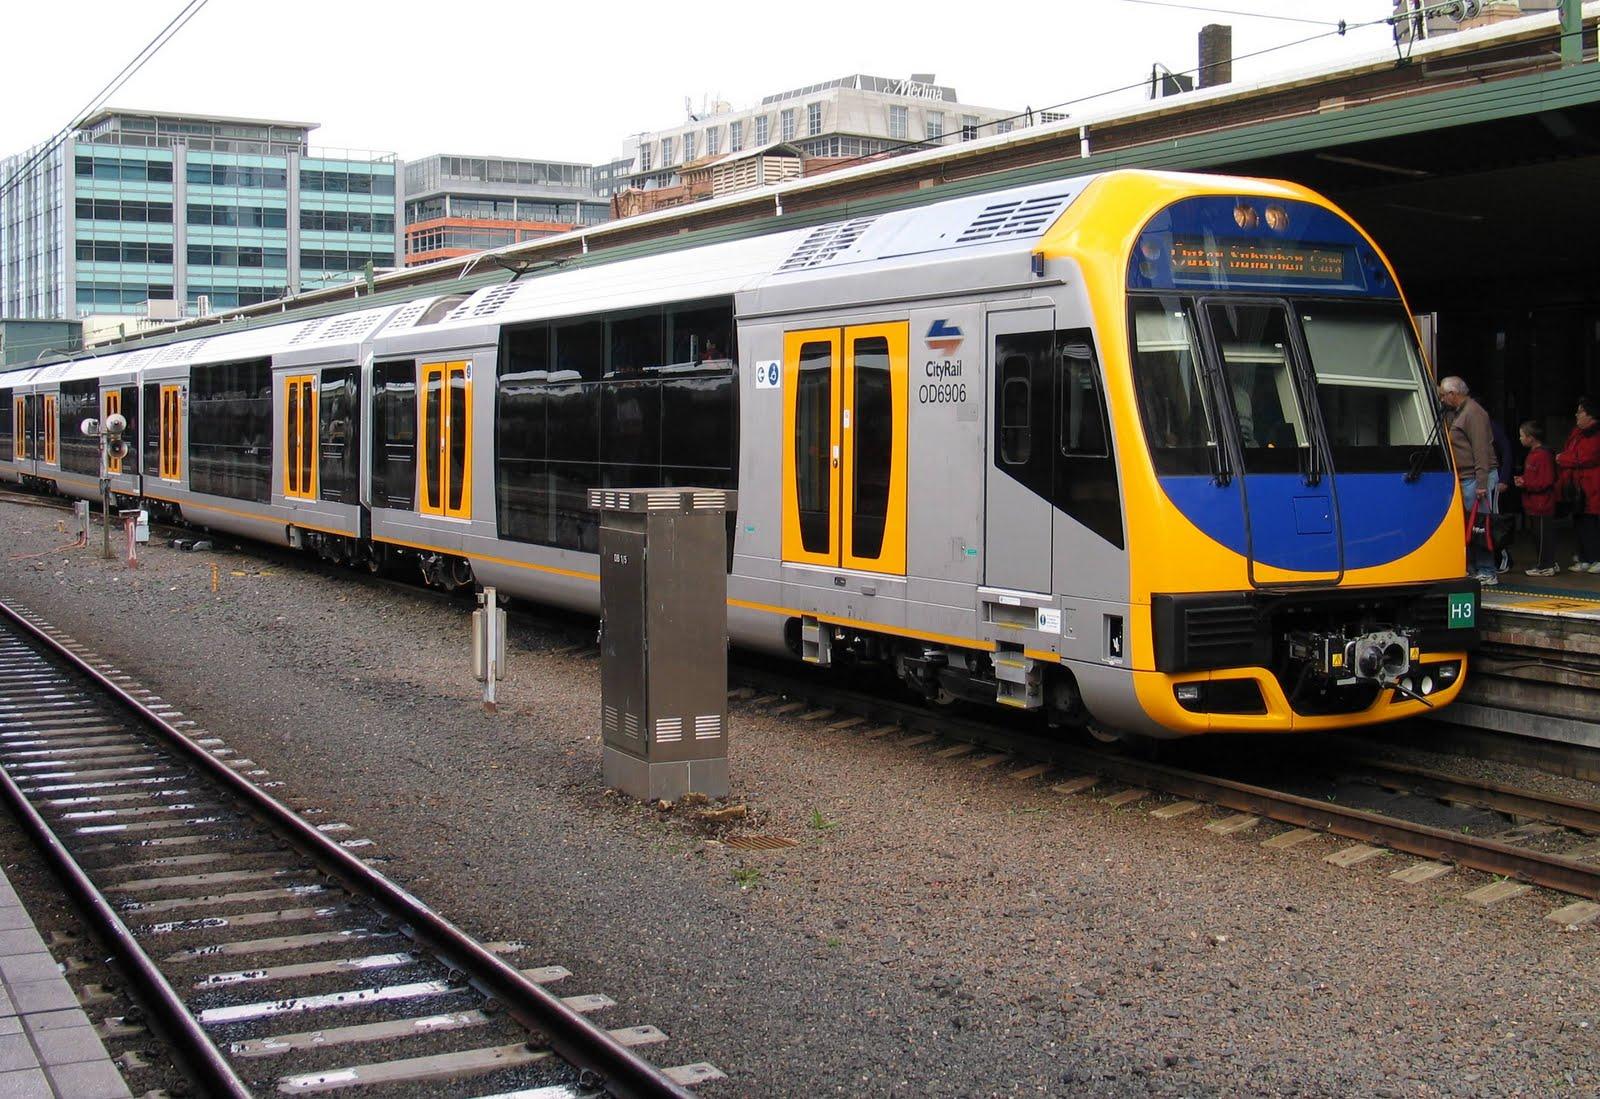 sydney trains - photo #10